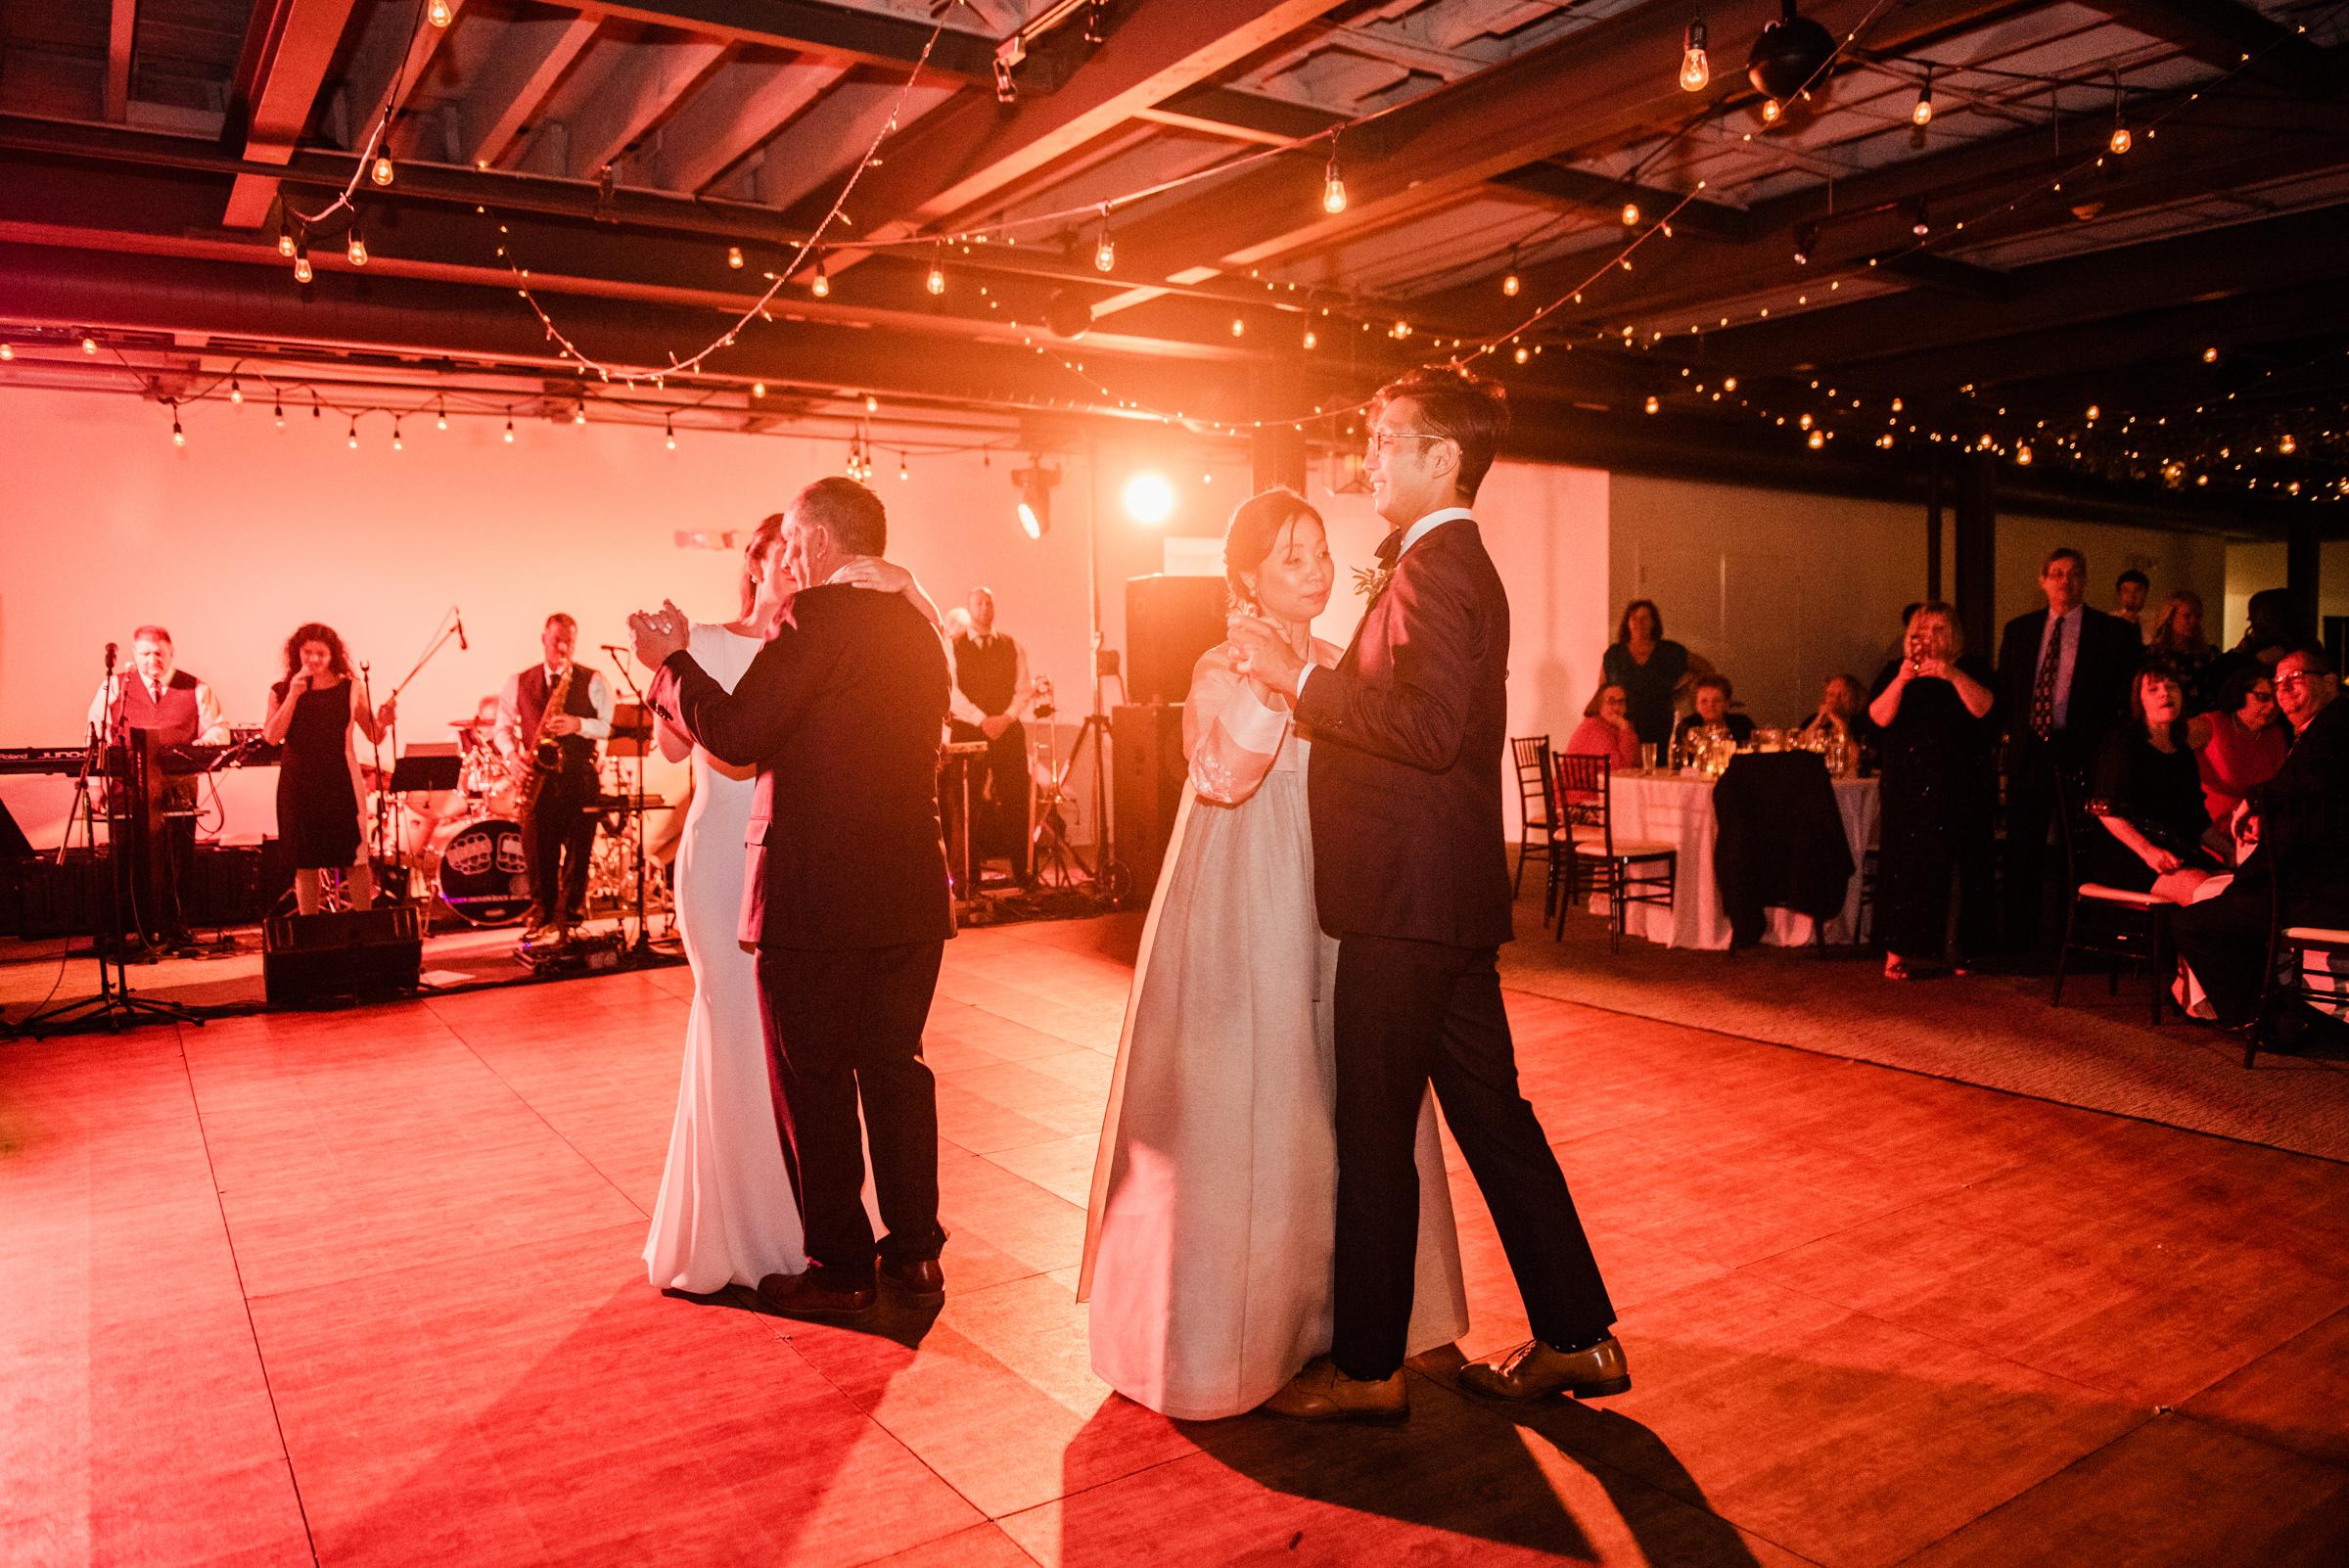 SKY_Armory_Syracuse_Wedding_JILL_STUDIO_Rochester_NY_Photographer_DSC_6448.jpg